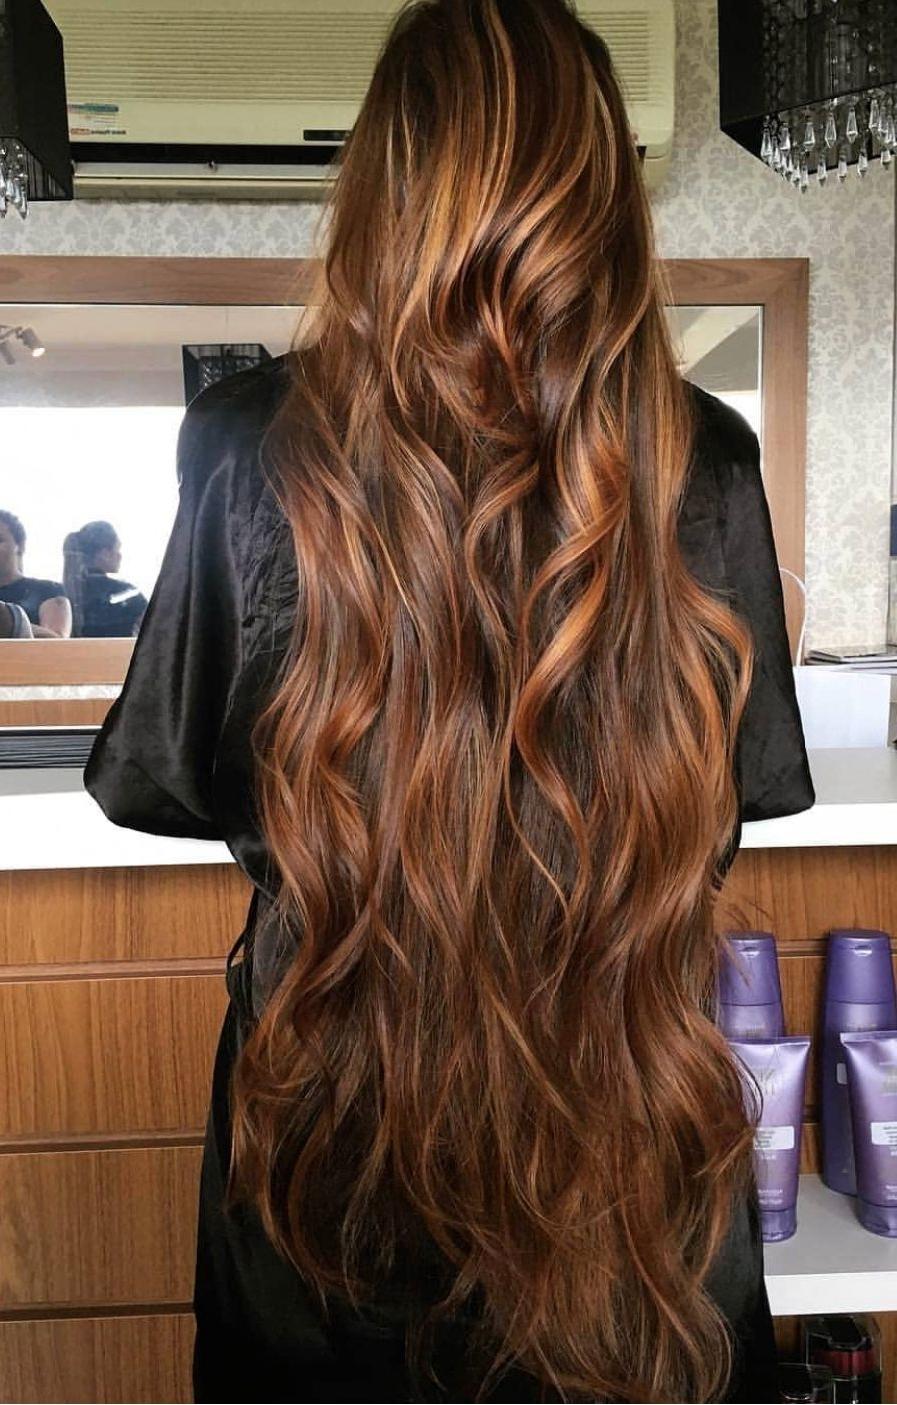 Pinithildis On ❤ Long Hair ❤ (View 18 of 20)